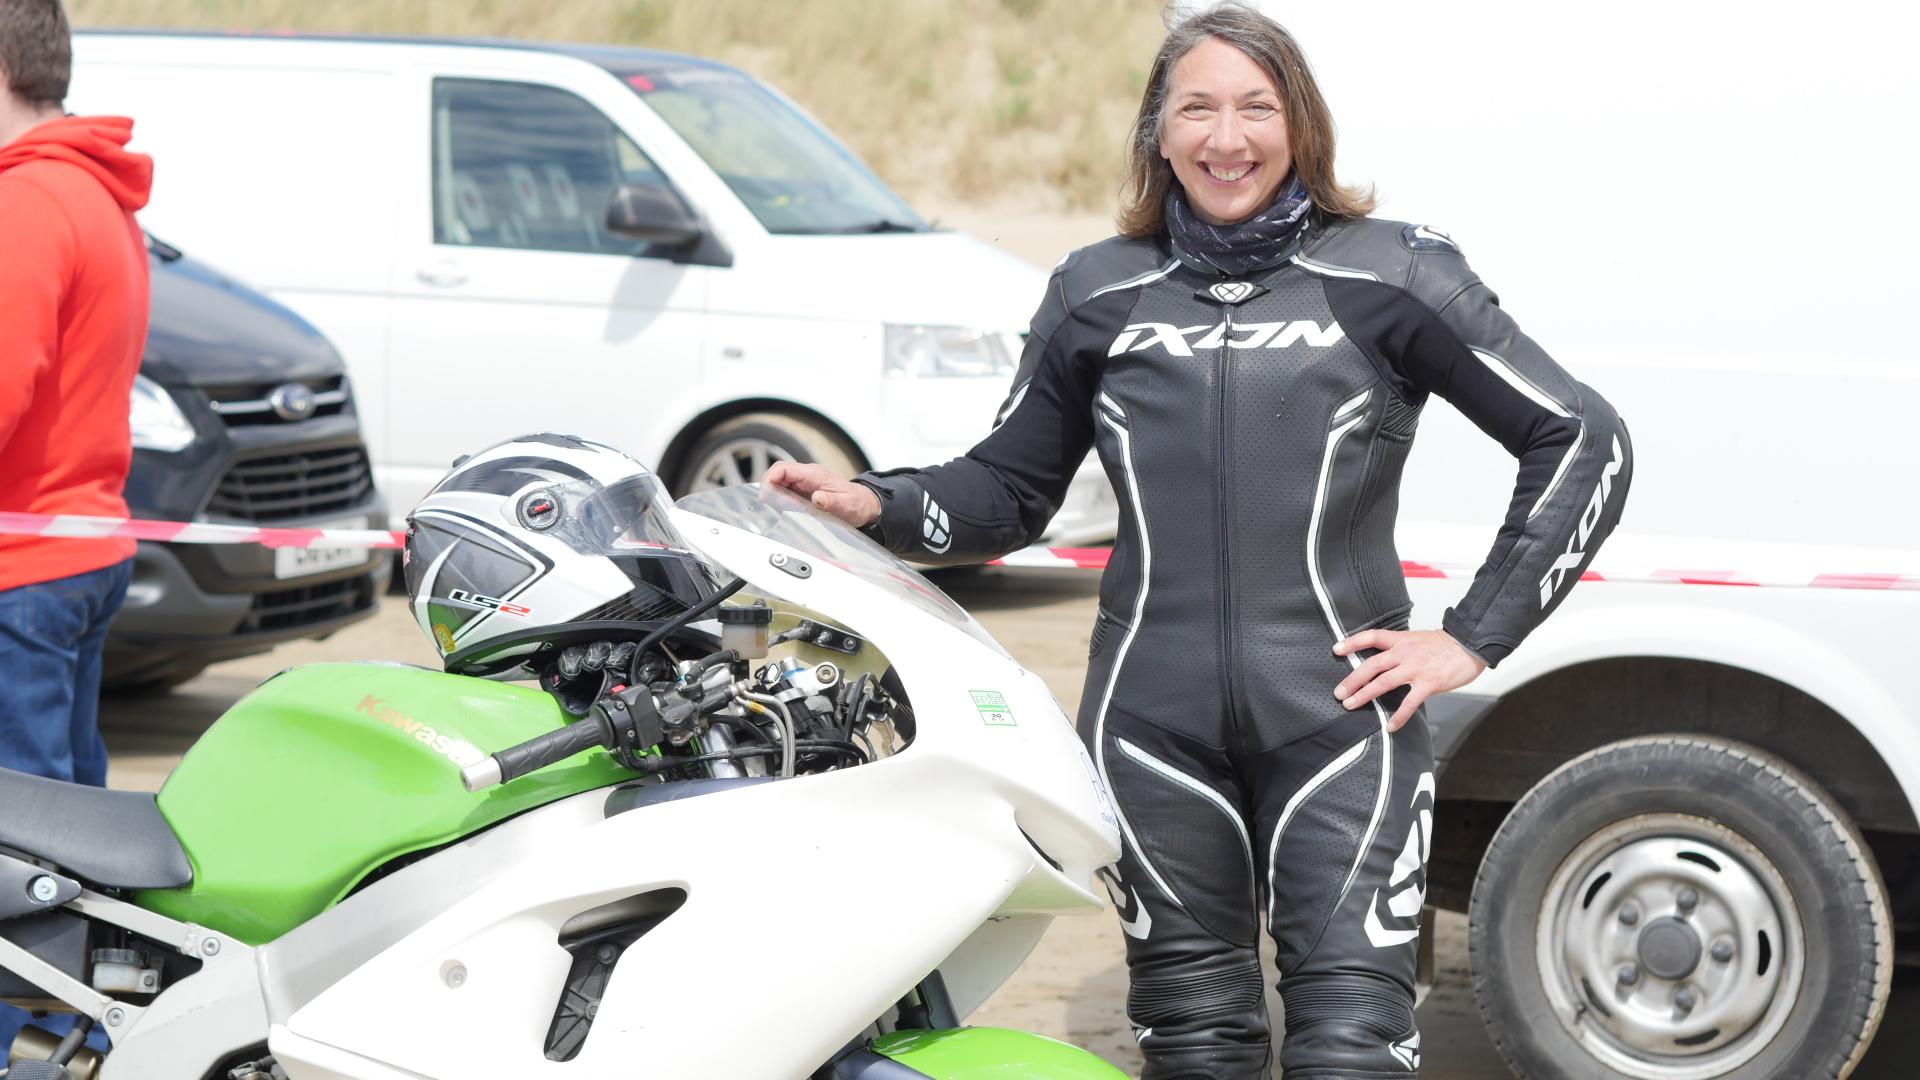 Louisa-Swaden-Adventure-Rider-Radio-Motorcycle-Podcast-3.JPG